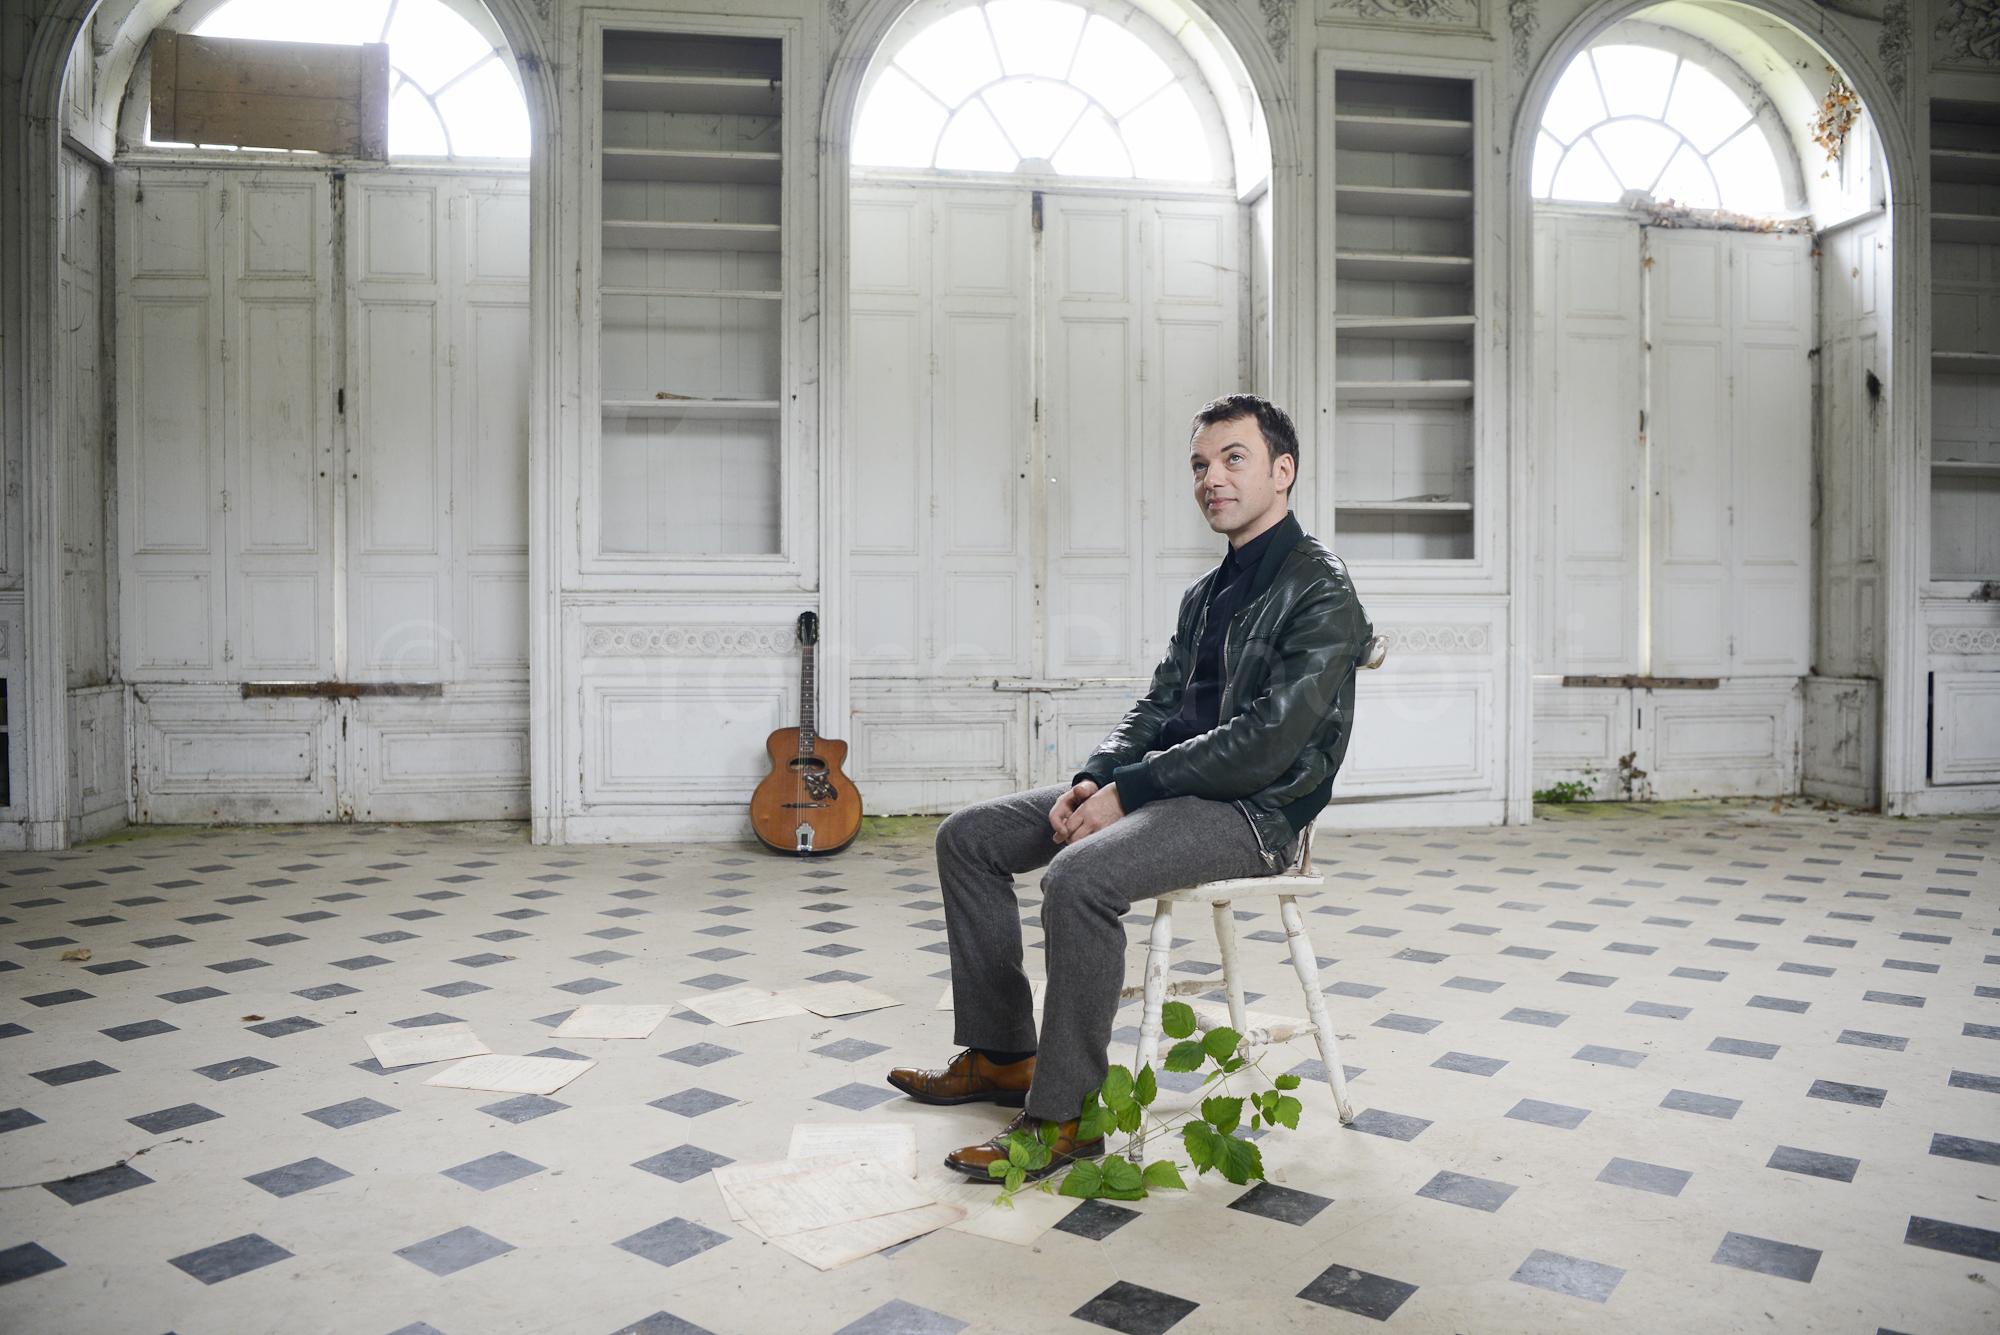 François Hegron